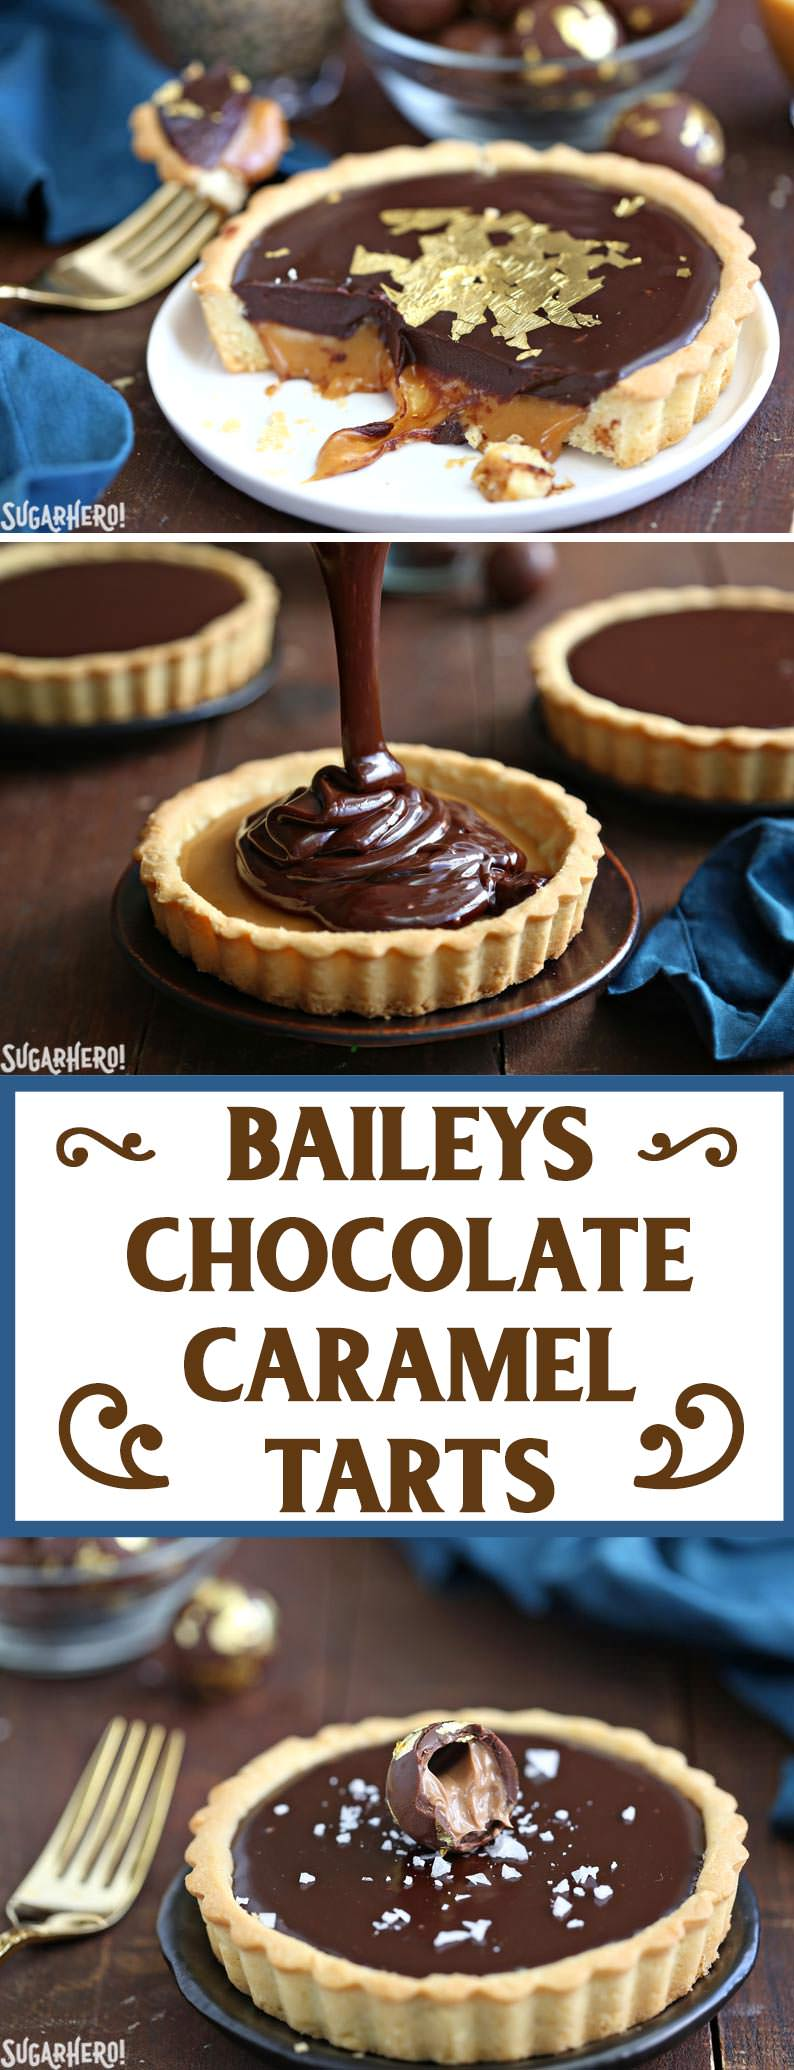 Baileys Chocolate Caramel Tarts - gorgeous mini tarts with a Baileys salted caramel filling and Baileys chocolate ganache!